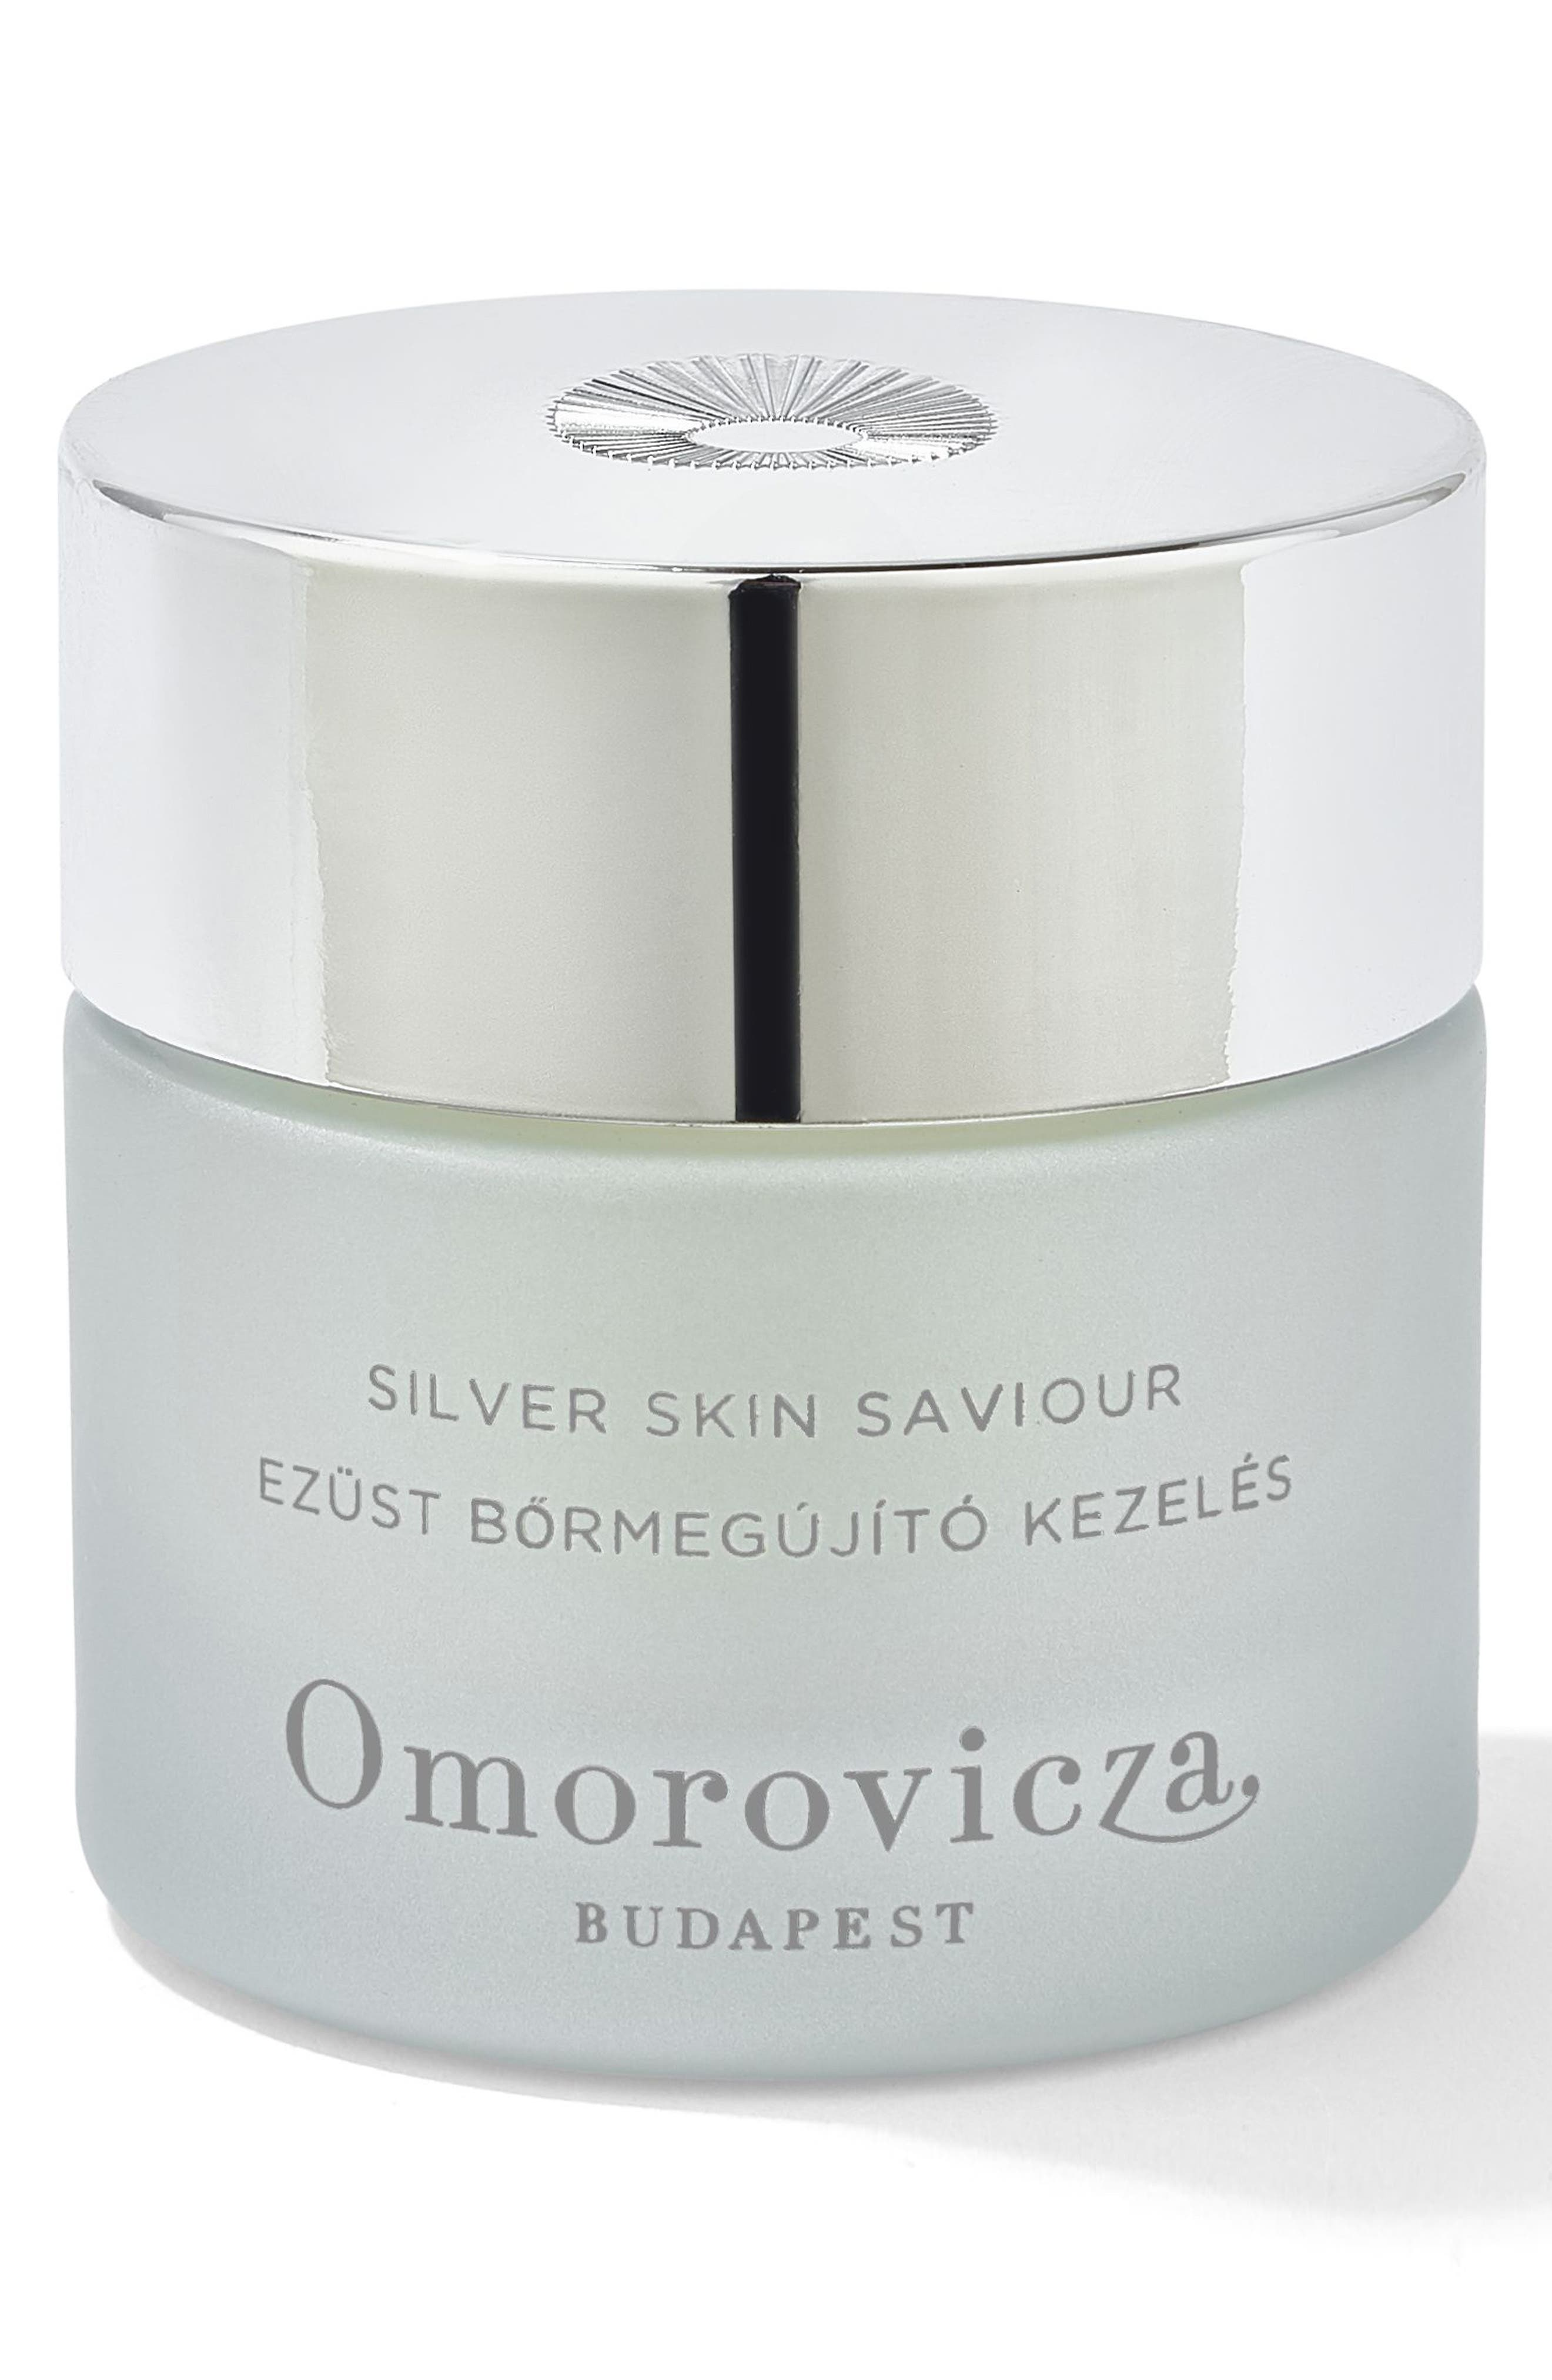 Silver Skin Saviour Face Mask,                             Main thumbnail 1, color,                             NO COLOR